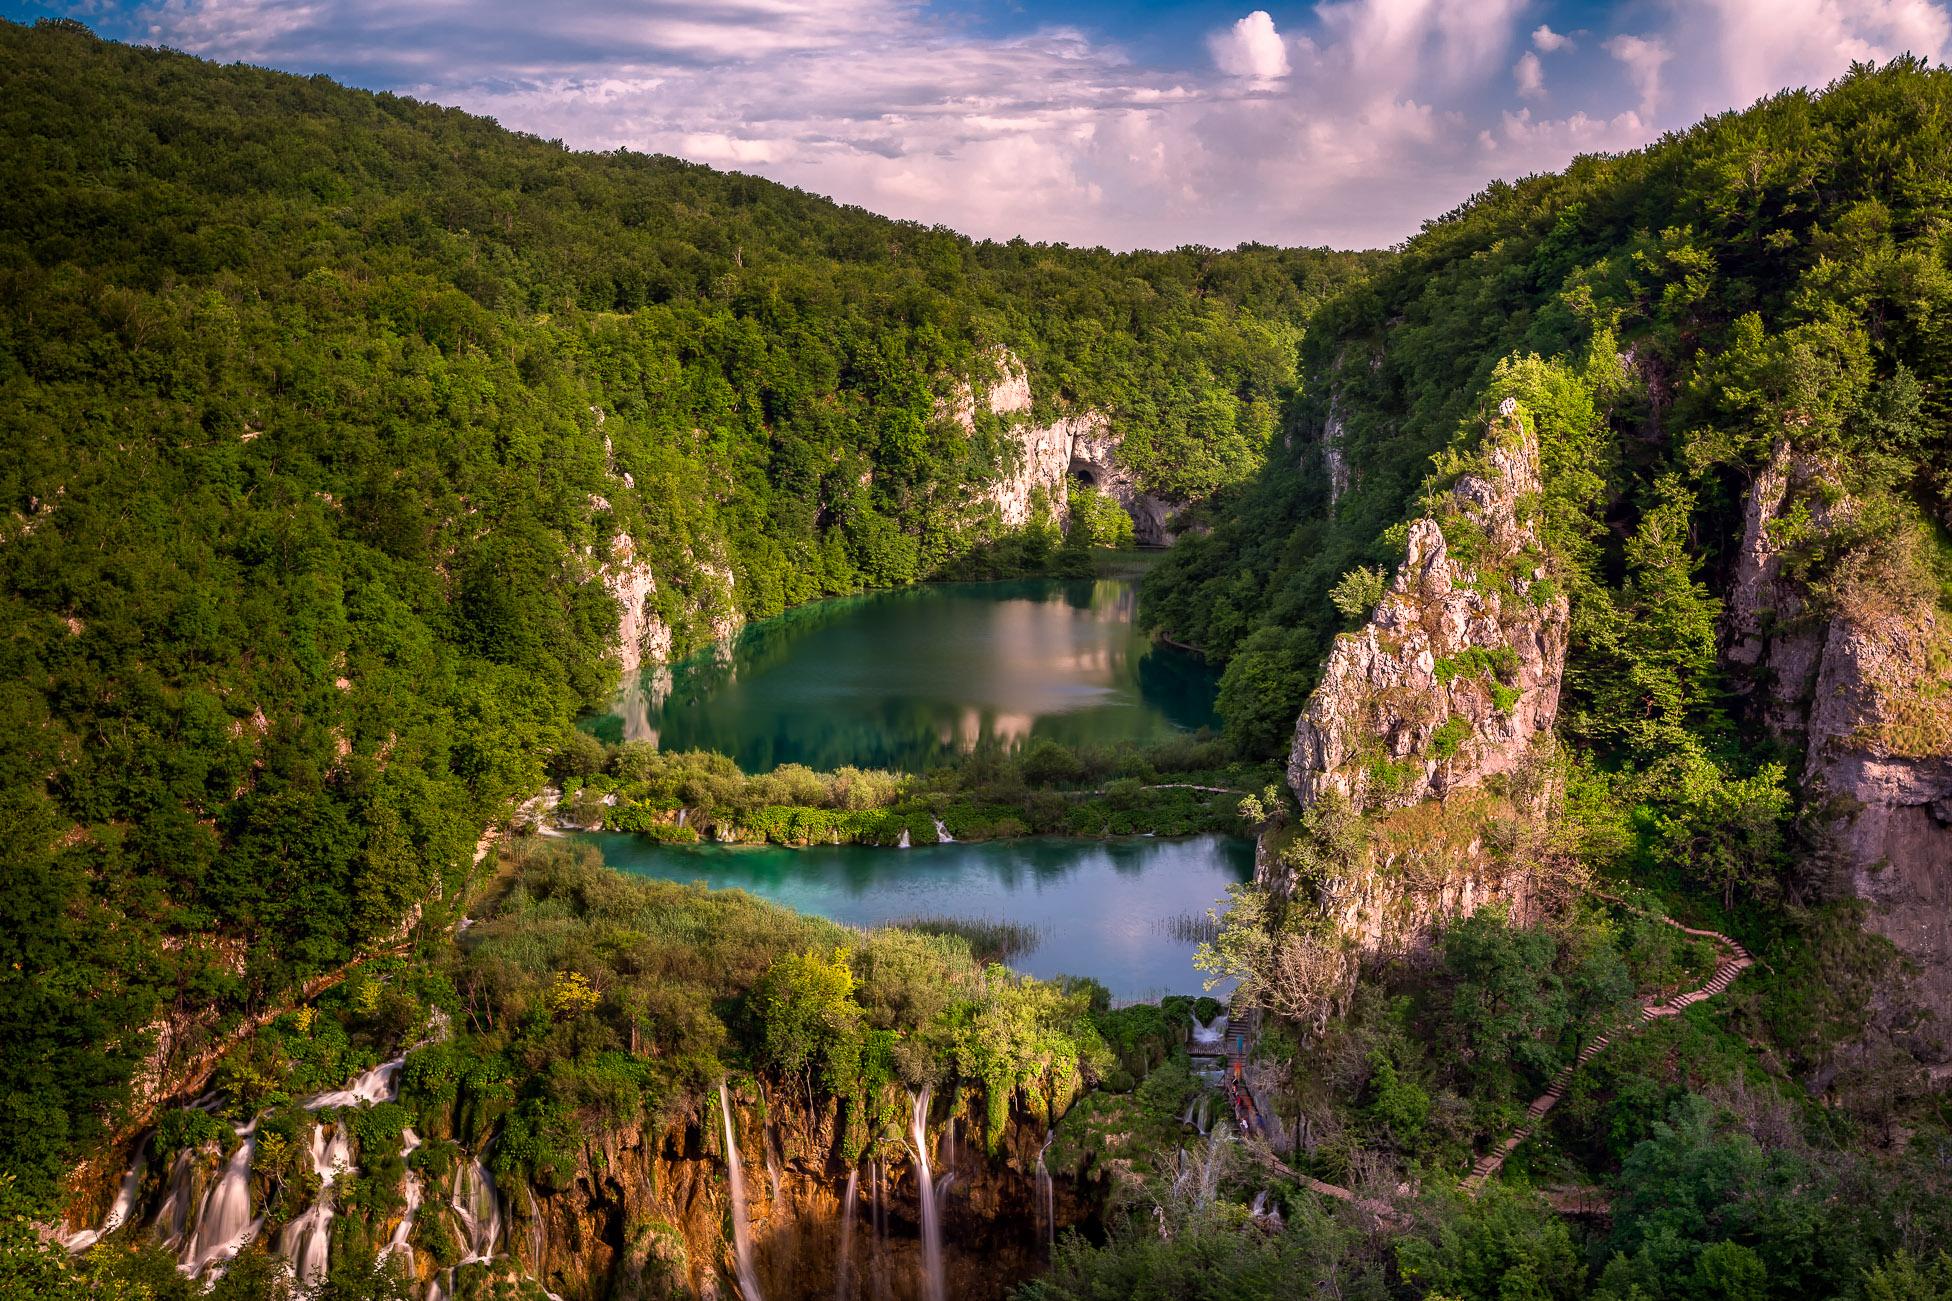 Aerial View on Waterfalls in Plitvice National Park, Donja Jezera, Croatia